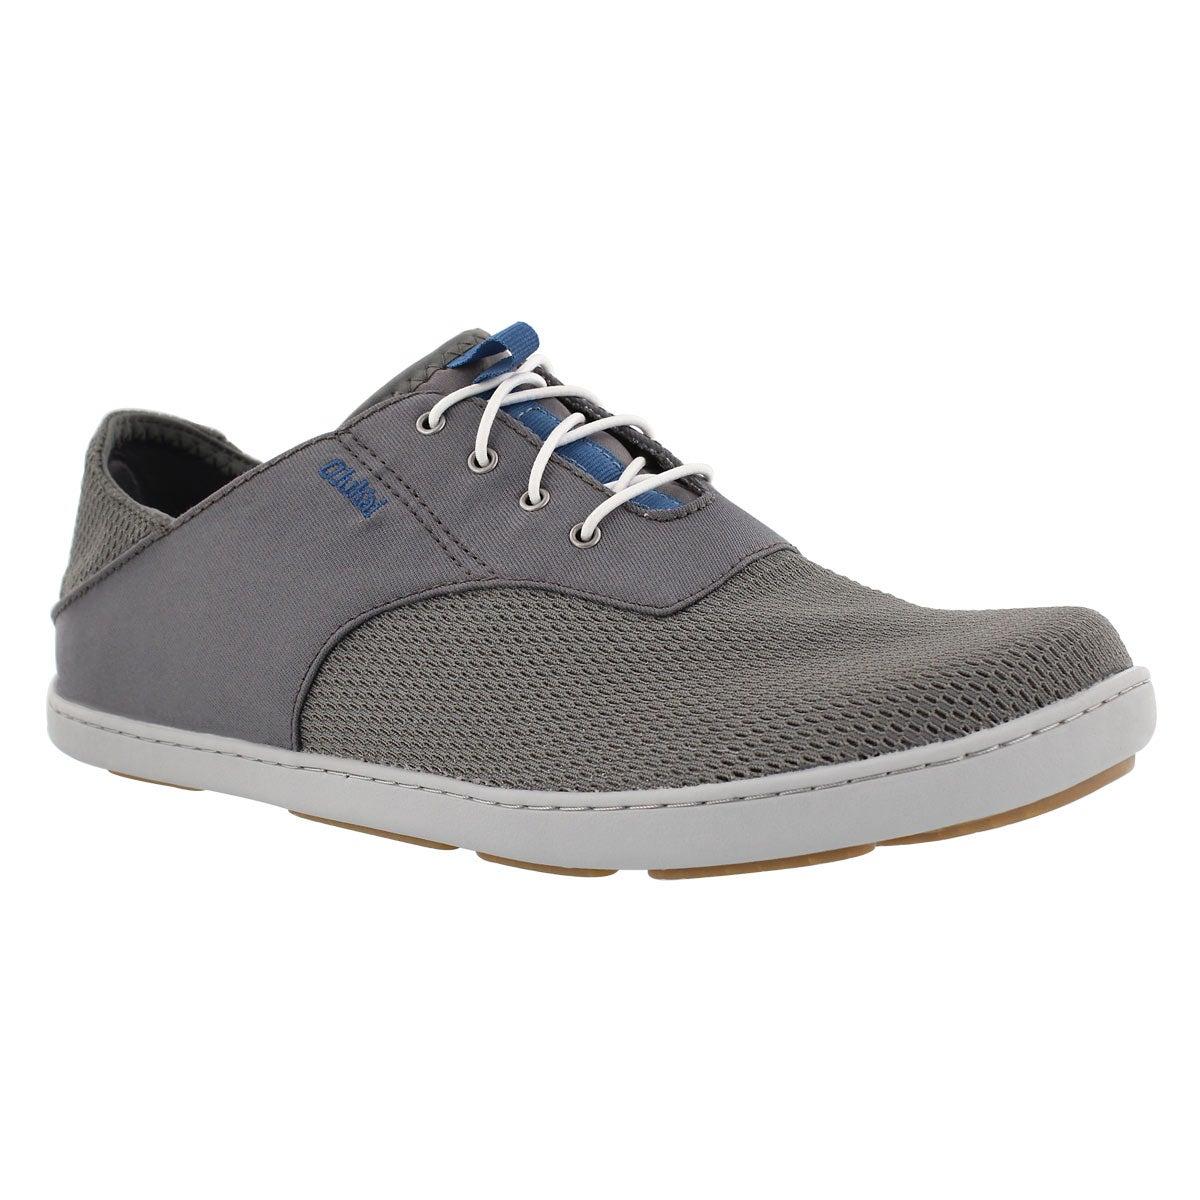 Mns Nohea Moku fog/charcoal sneaker